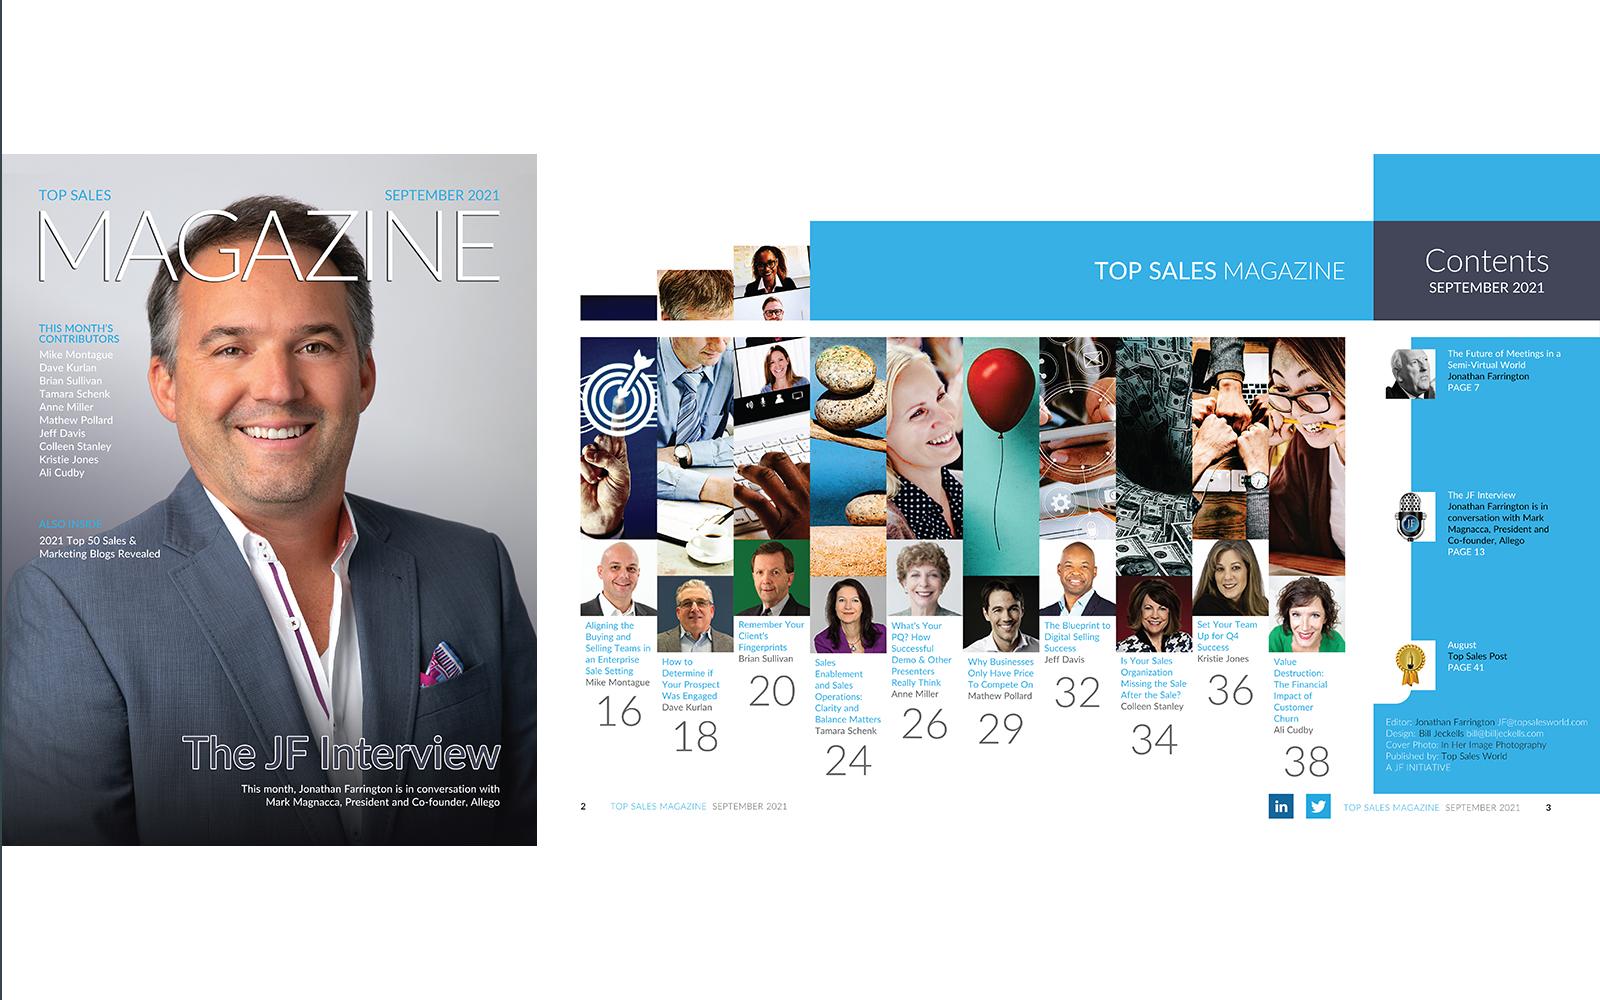 Top Sales Magazine September 2021